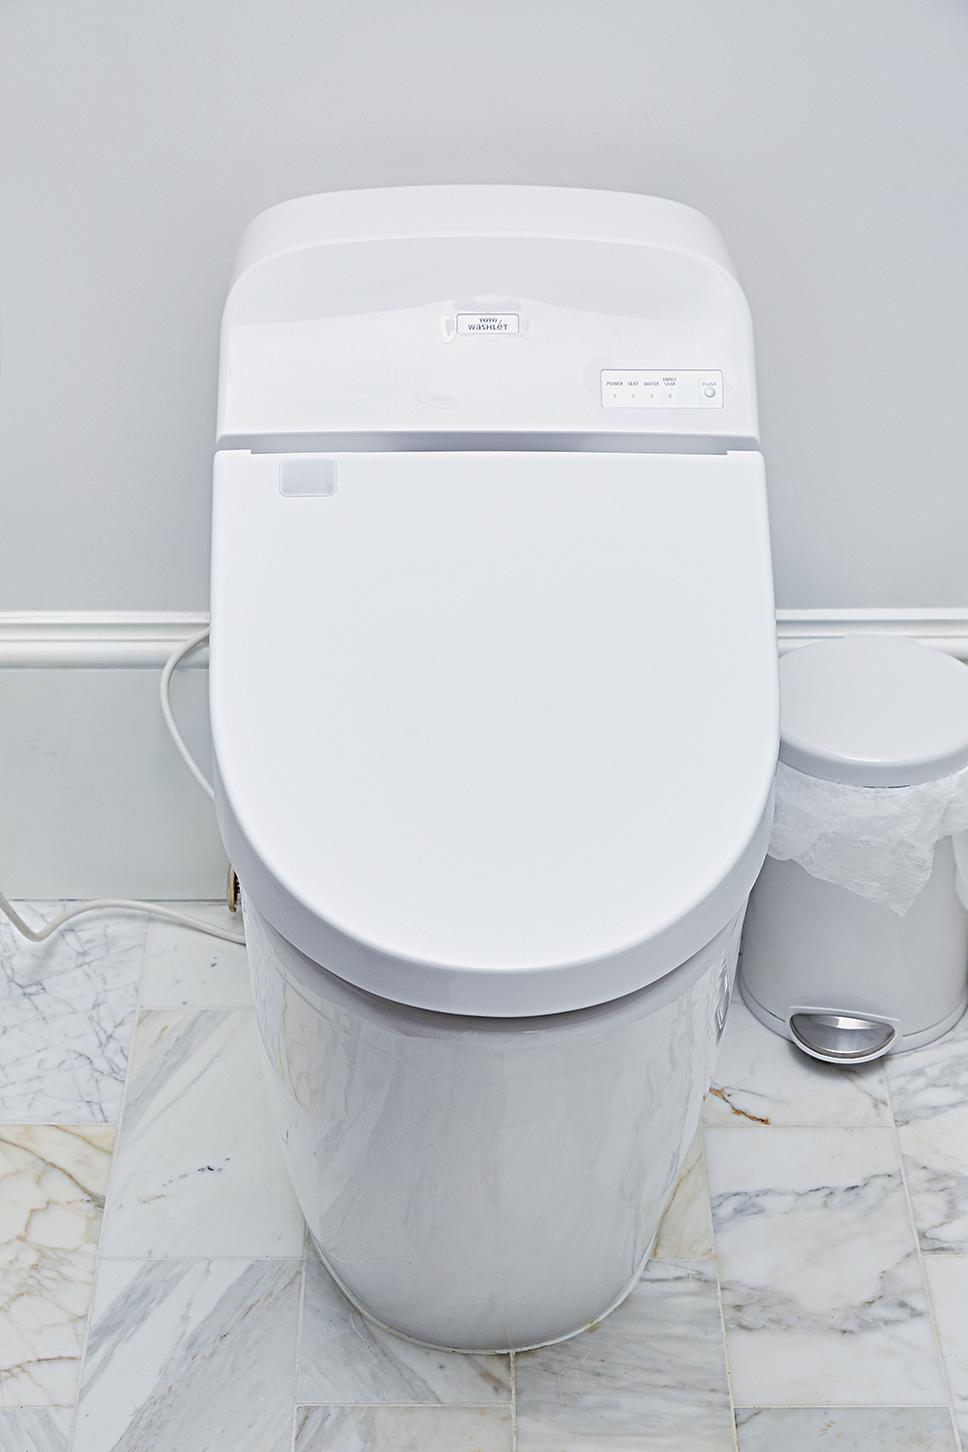 The Bathroom of the Future Has a $5,000 Toilet | Washingtonian